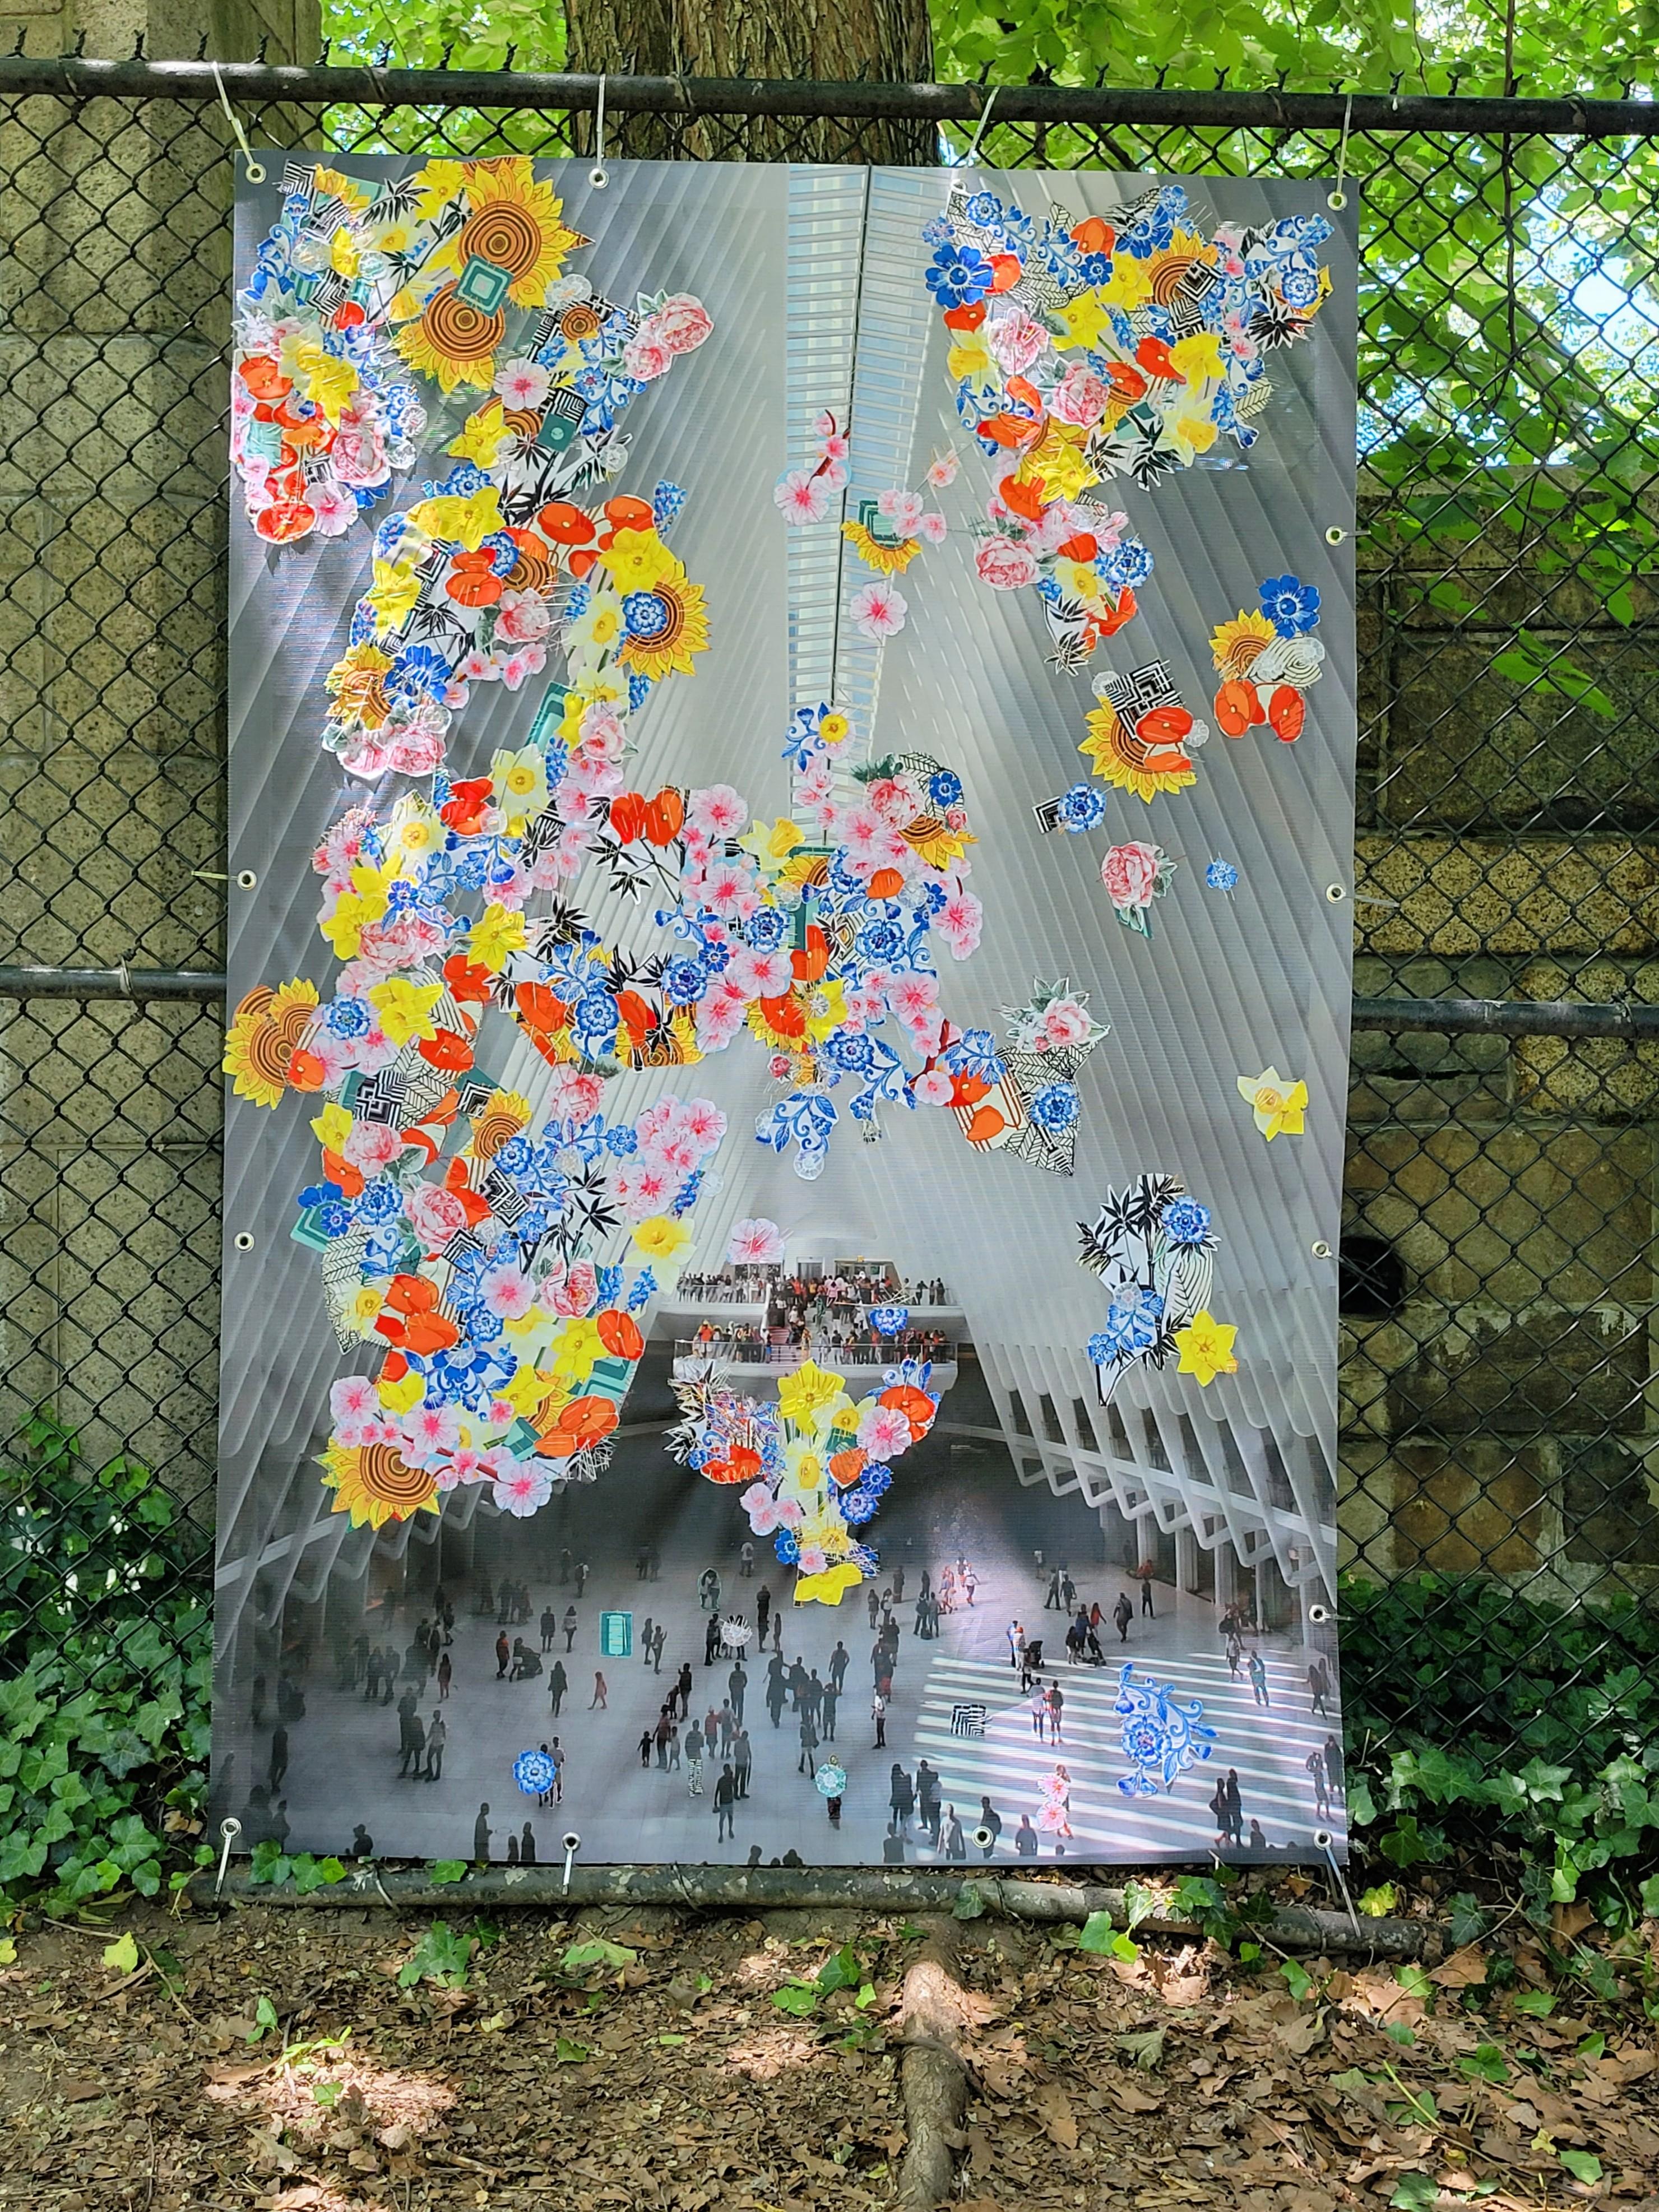 Re:Growth Public Art Piece - Ocufluent I & II by WOOLPUNK at Riverside Park